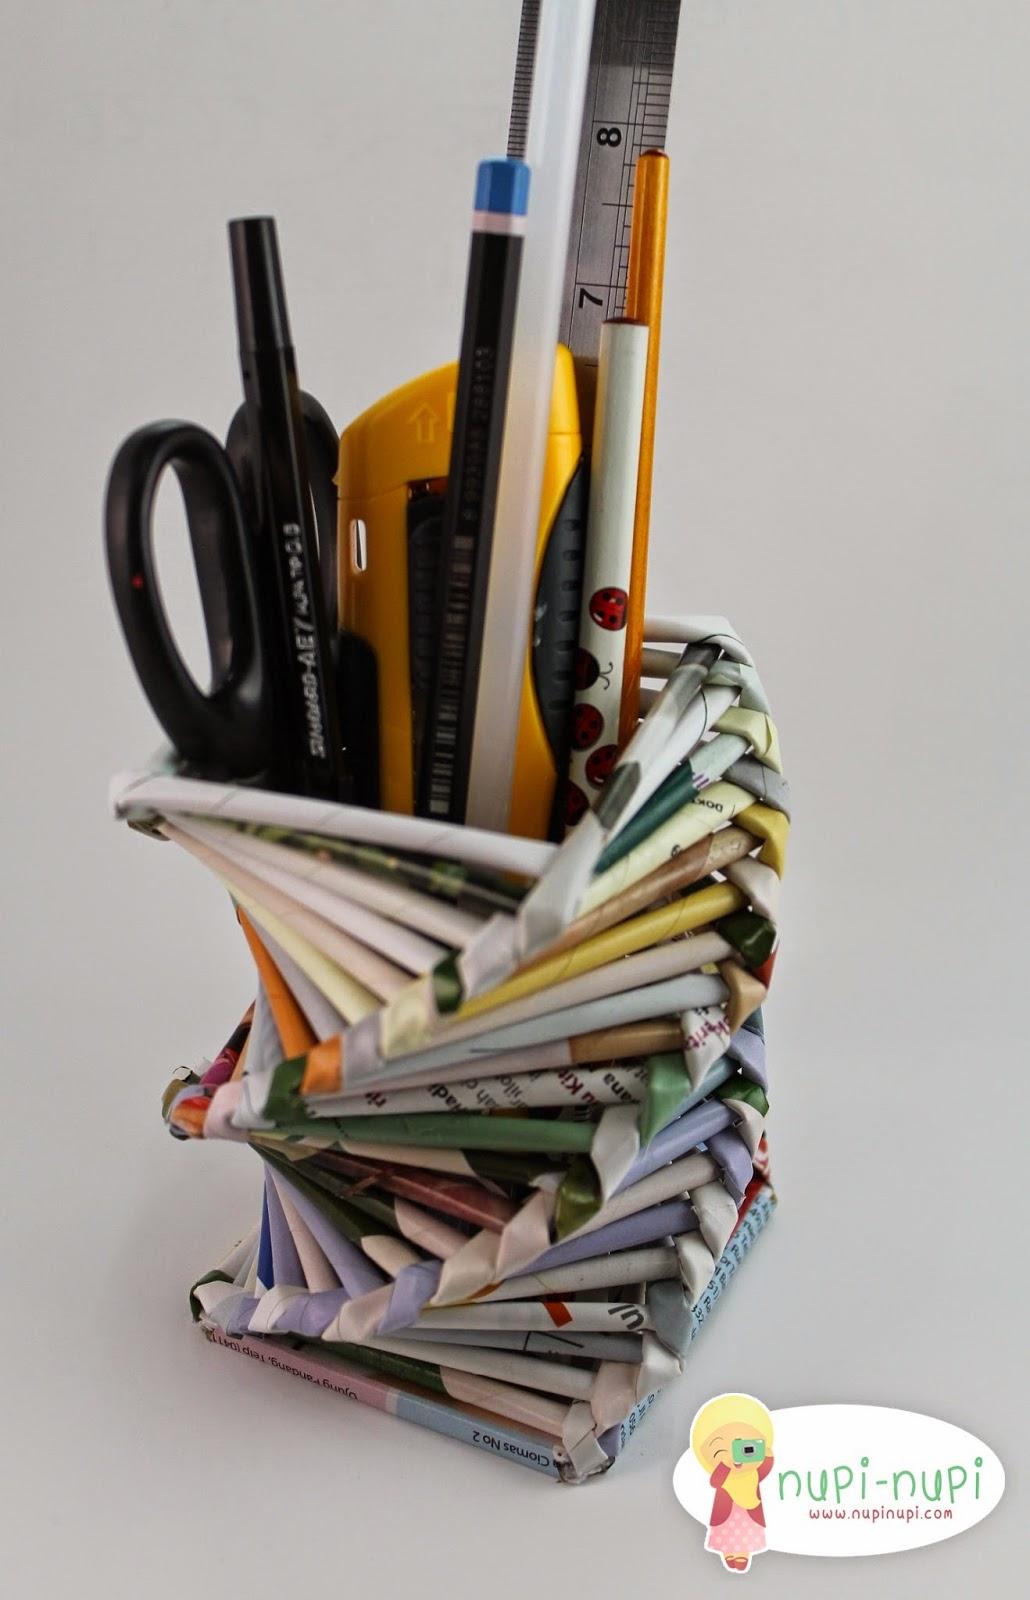 Cara Membuat Kerajinan Tangan Koran 2010 : membuat, kerajinan, tangan, koran, Membuat, Kerajinan, Tangan, Koran, Bekas, Tempat, Pensil